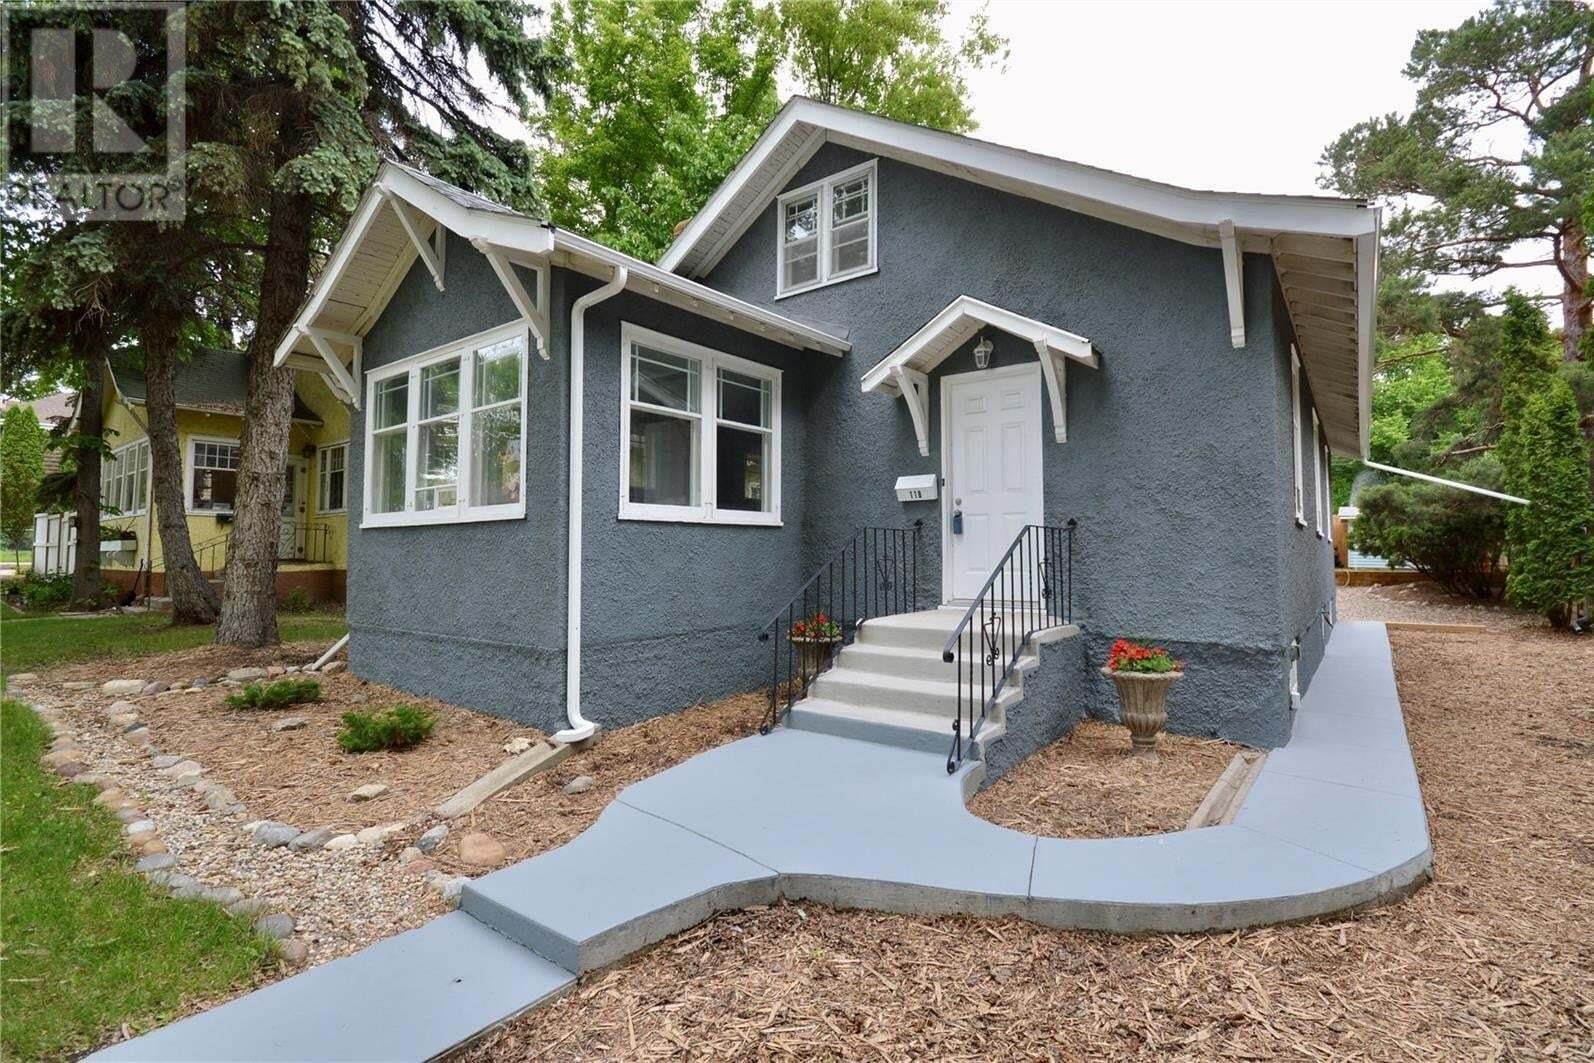 House for sale at 118 29th St W Saskatoon Saskatchewan - MLS: SK811175